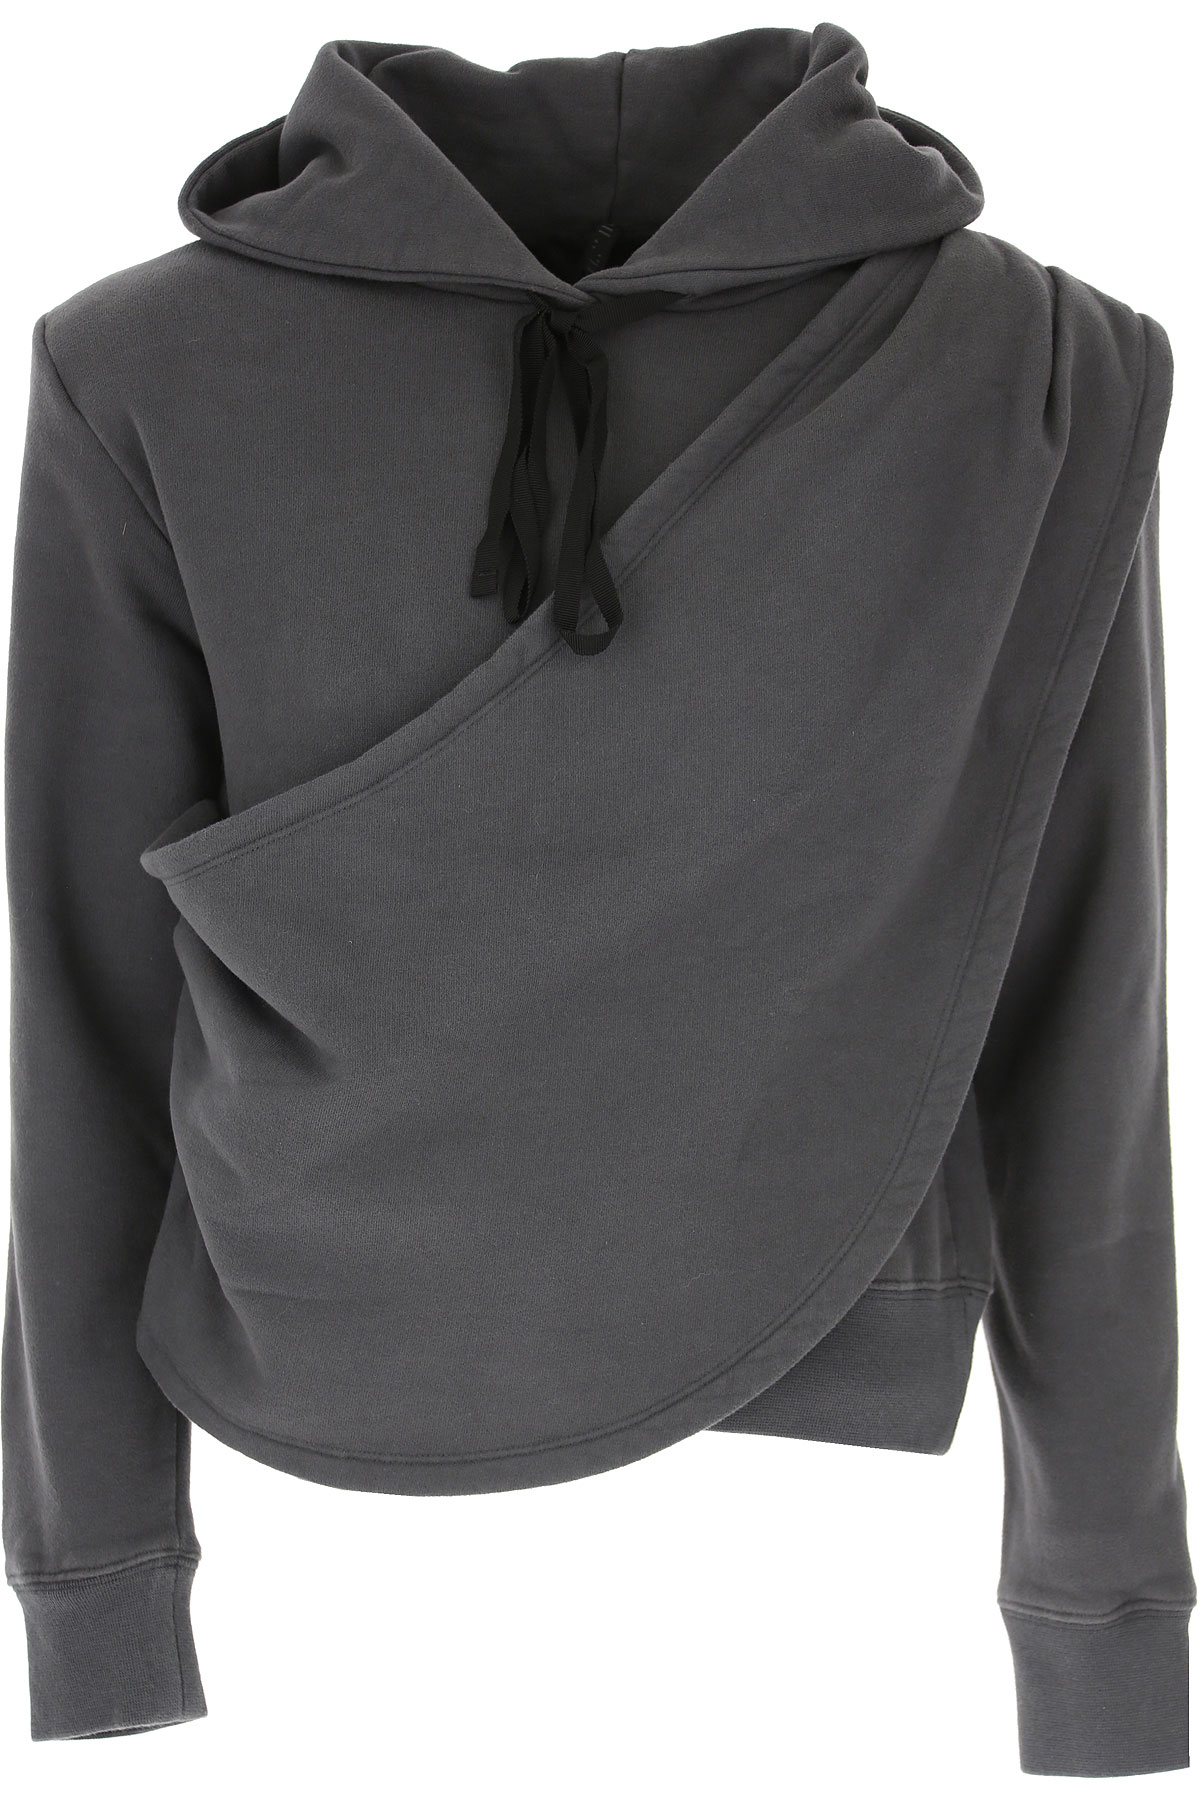 Image of Unravel Project Sweatshirt for Women, Medium Grey, Cotton, 2017, 4 8